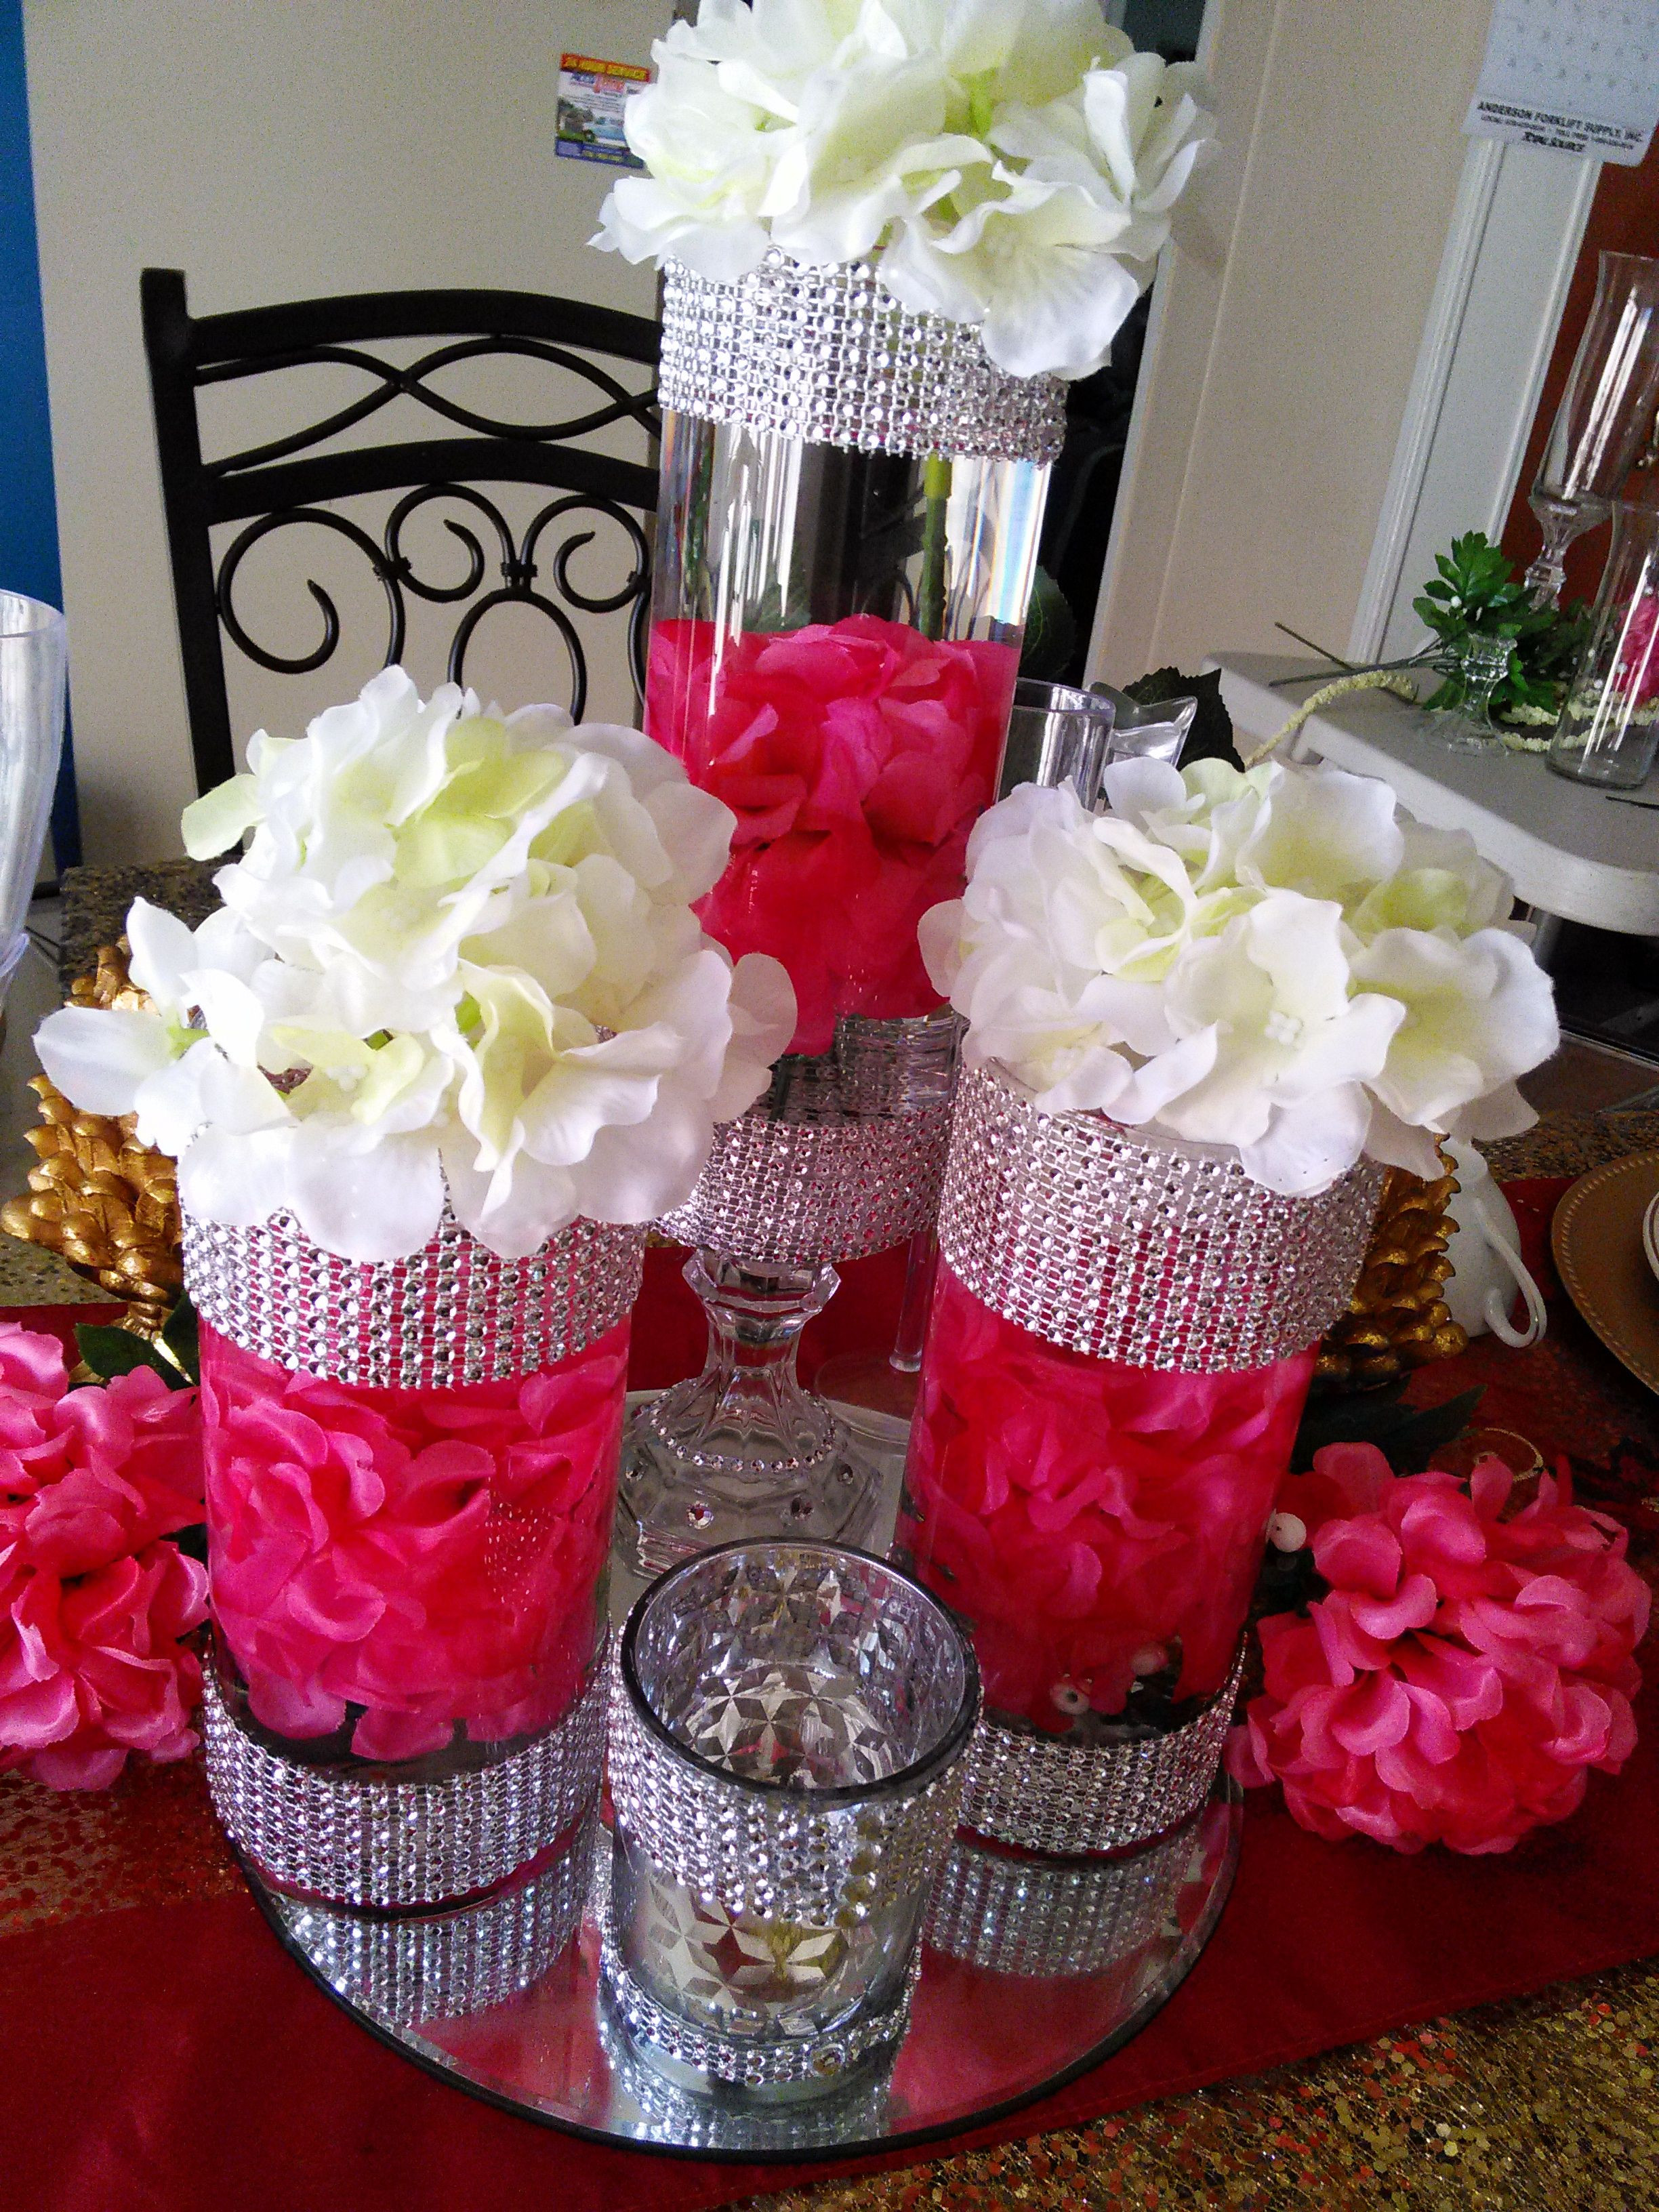 picture frame vase centerpiece of pin by a d elegantevents on adee centerpieces pinterest dollar within centerpieces center pieces center table centre pieces centerpiece ideas